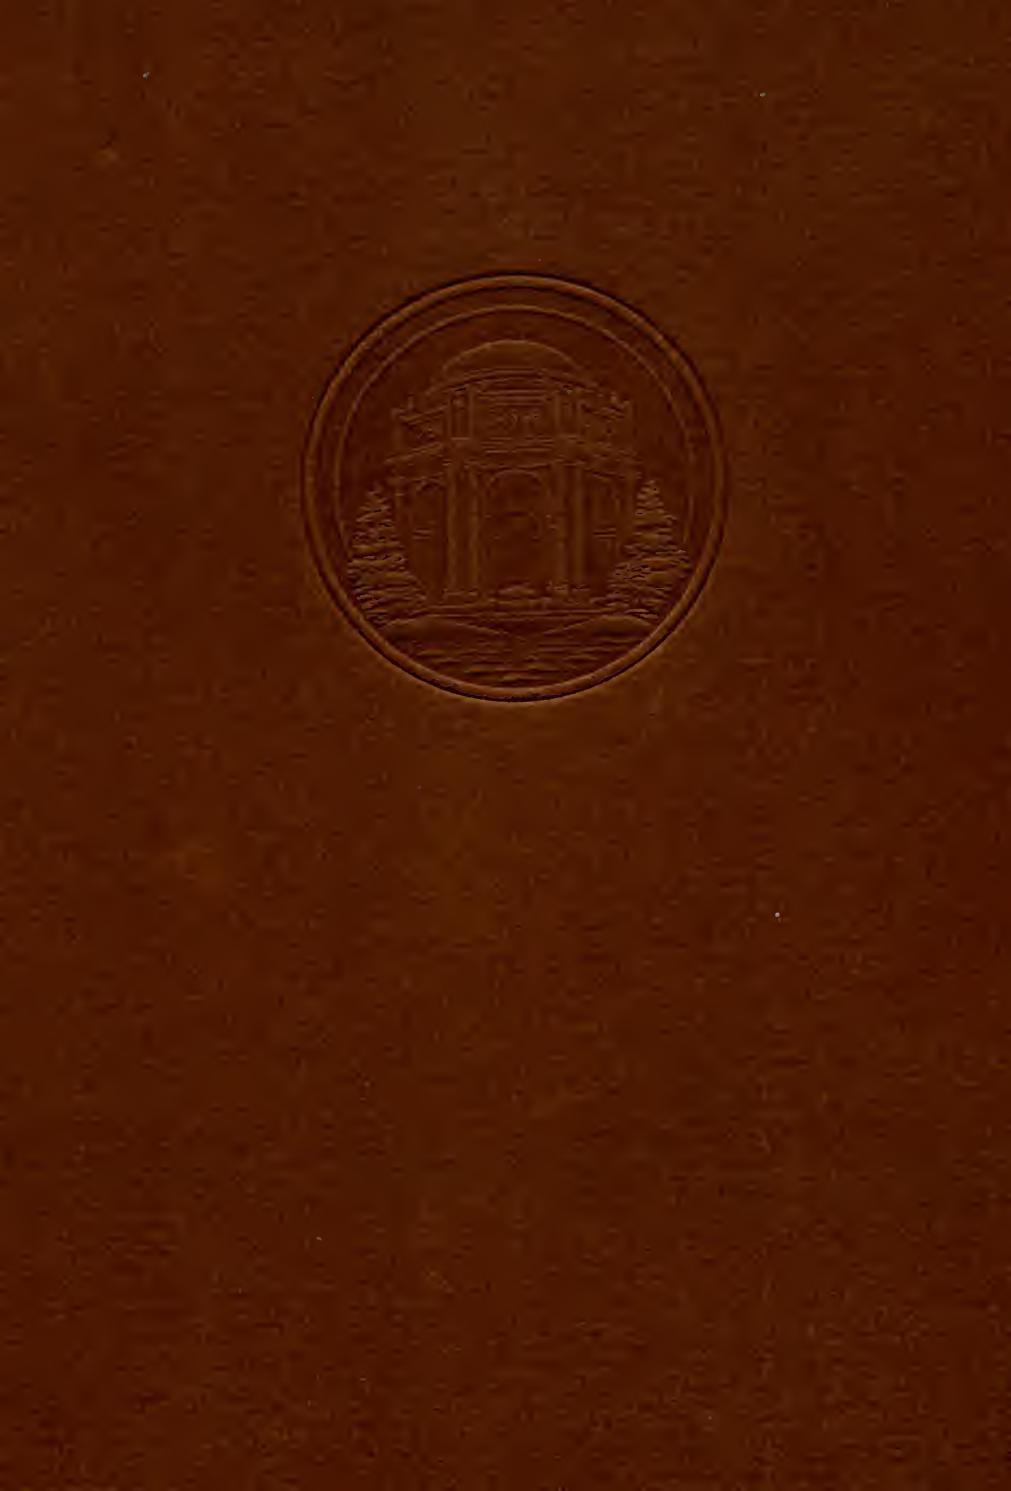 Catalogue De Luxe 2 Universal Exposition 1915 By Bruno Manuel Dos